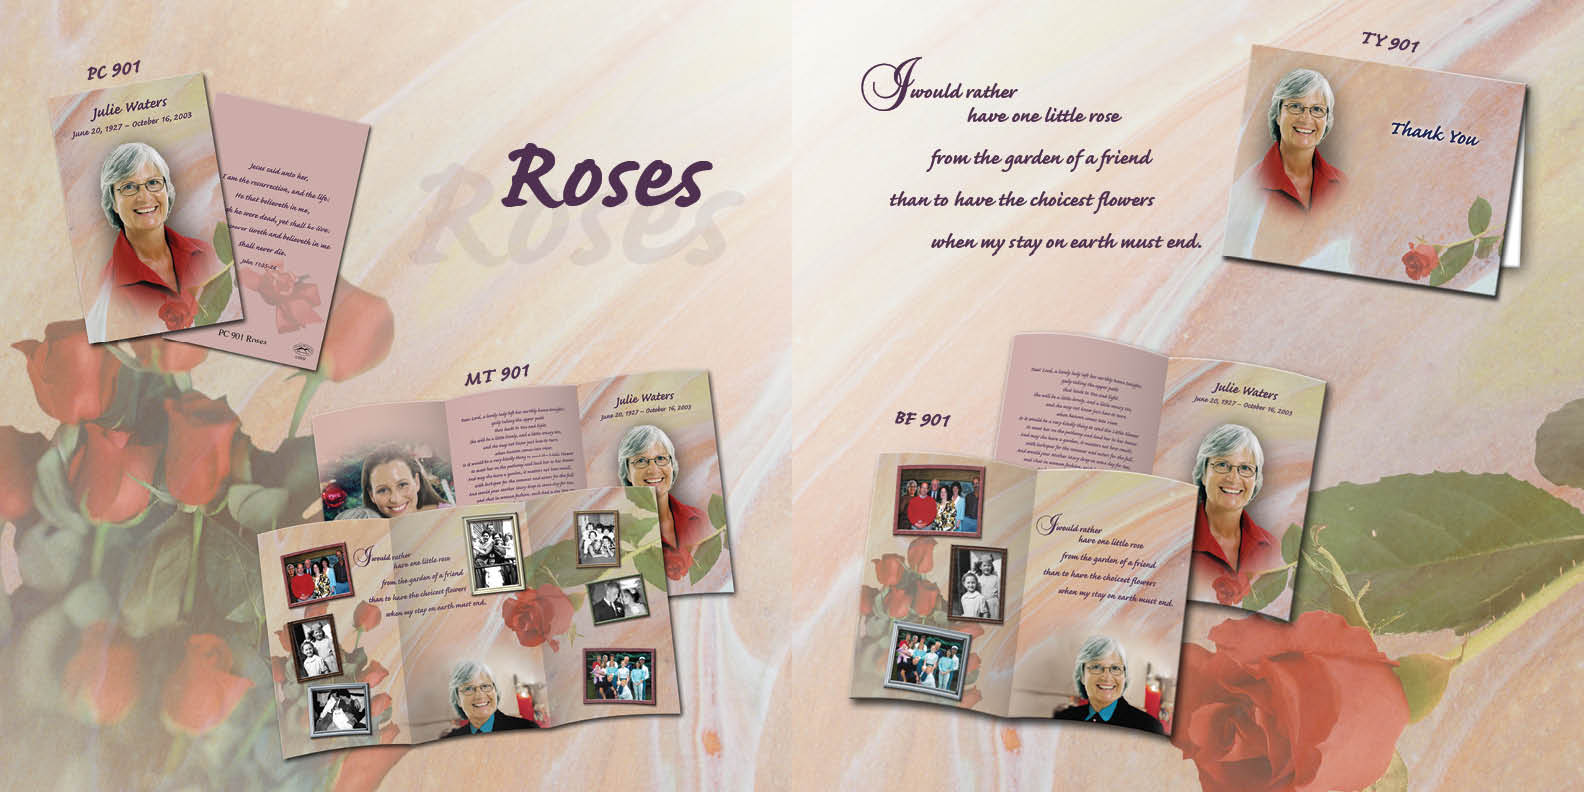 901 Roses